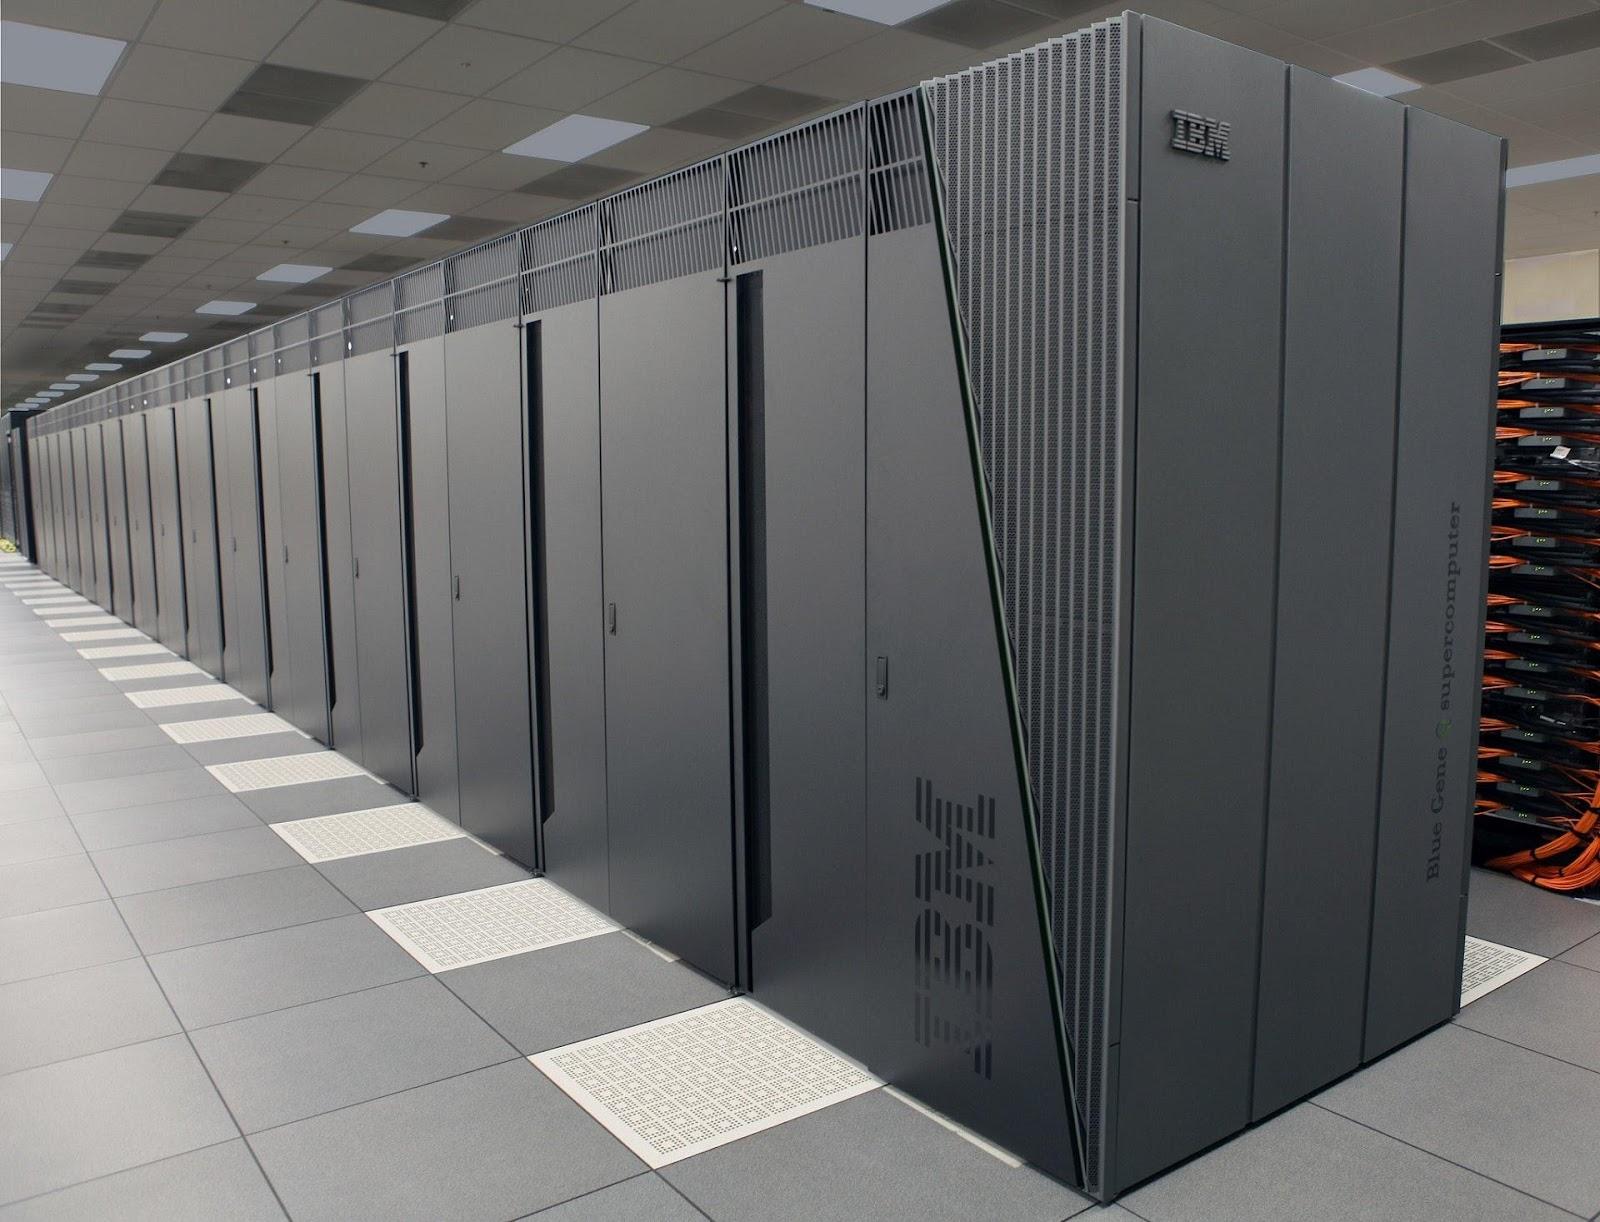 MAC OS X Hard drive:Users:Cazziewee:Desktop:airport-business-cabinets-236093.jpg